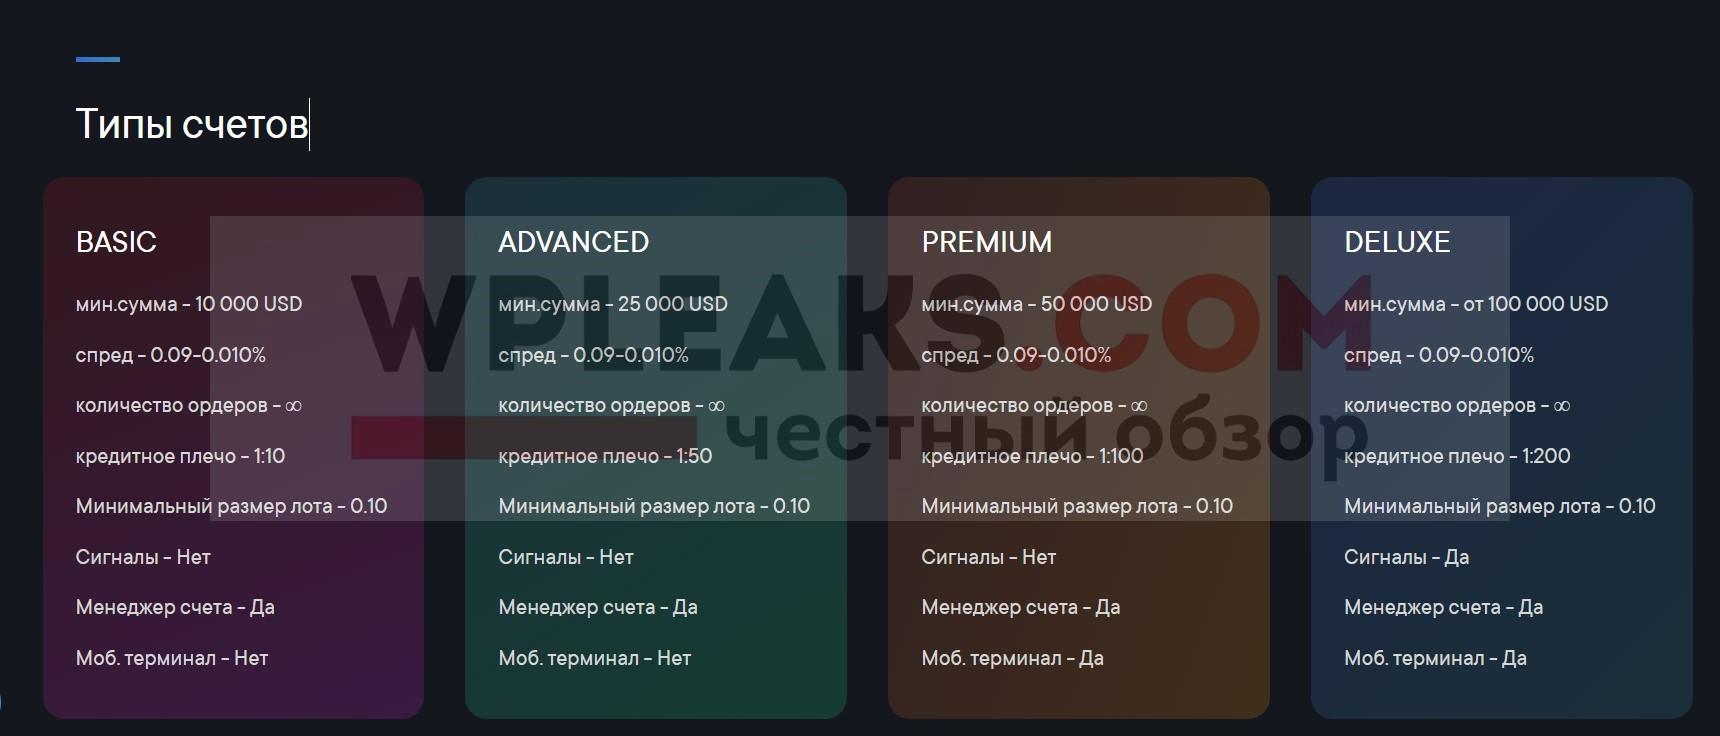 cmc-capital.net обзор